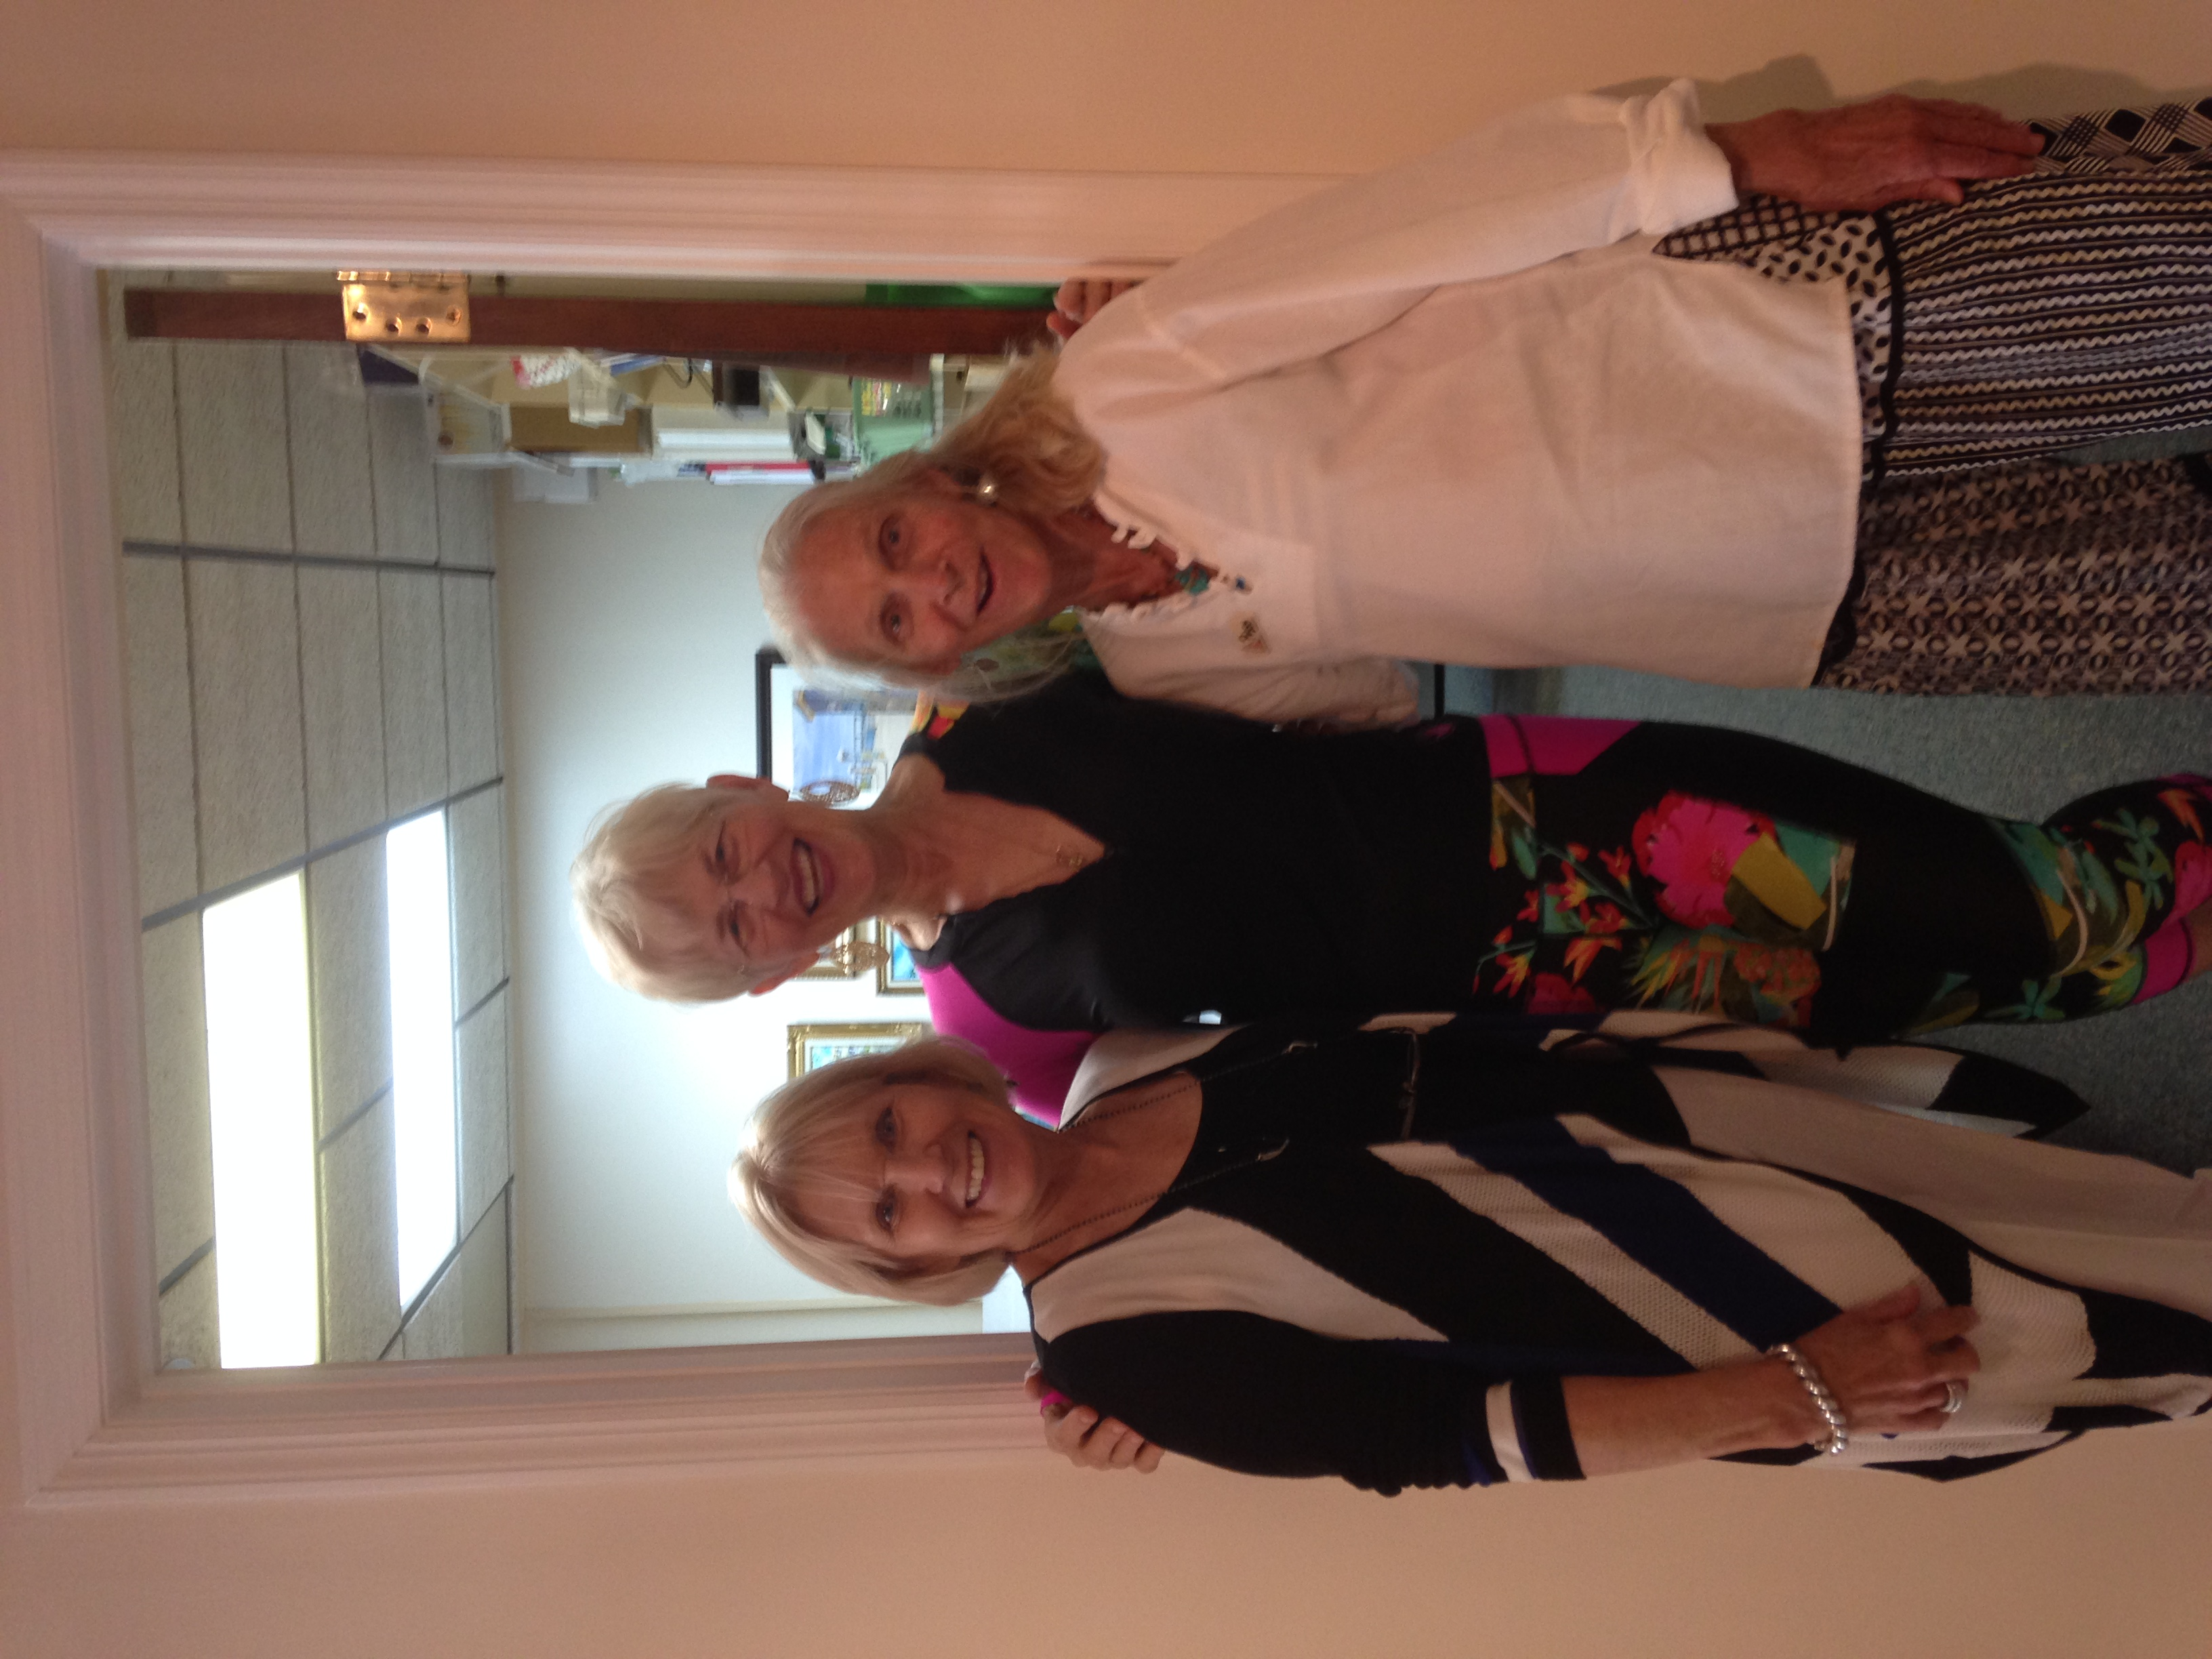 Judi, Rae Marie and Peggy